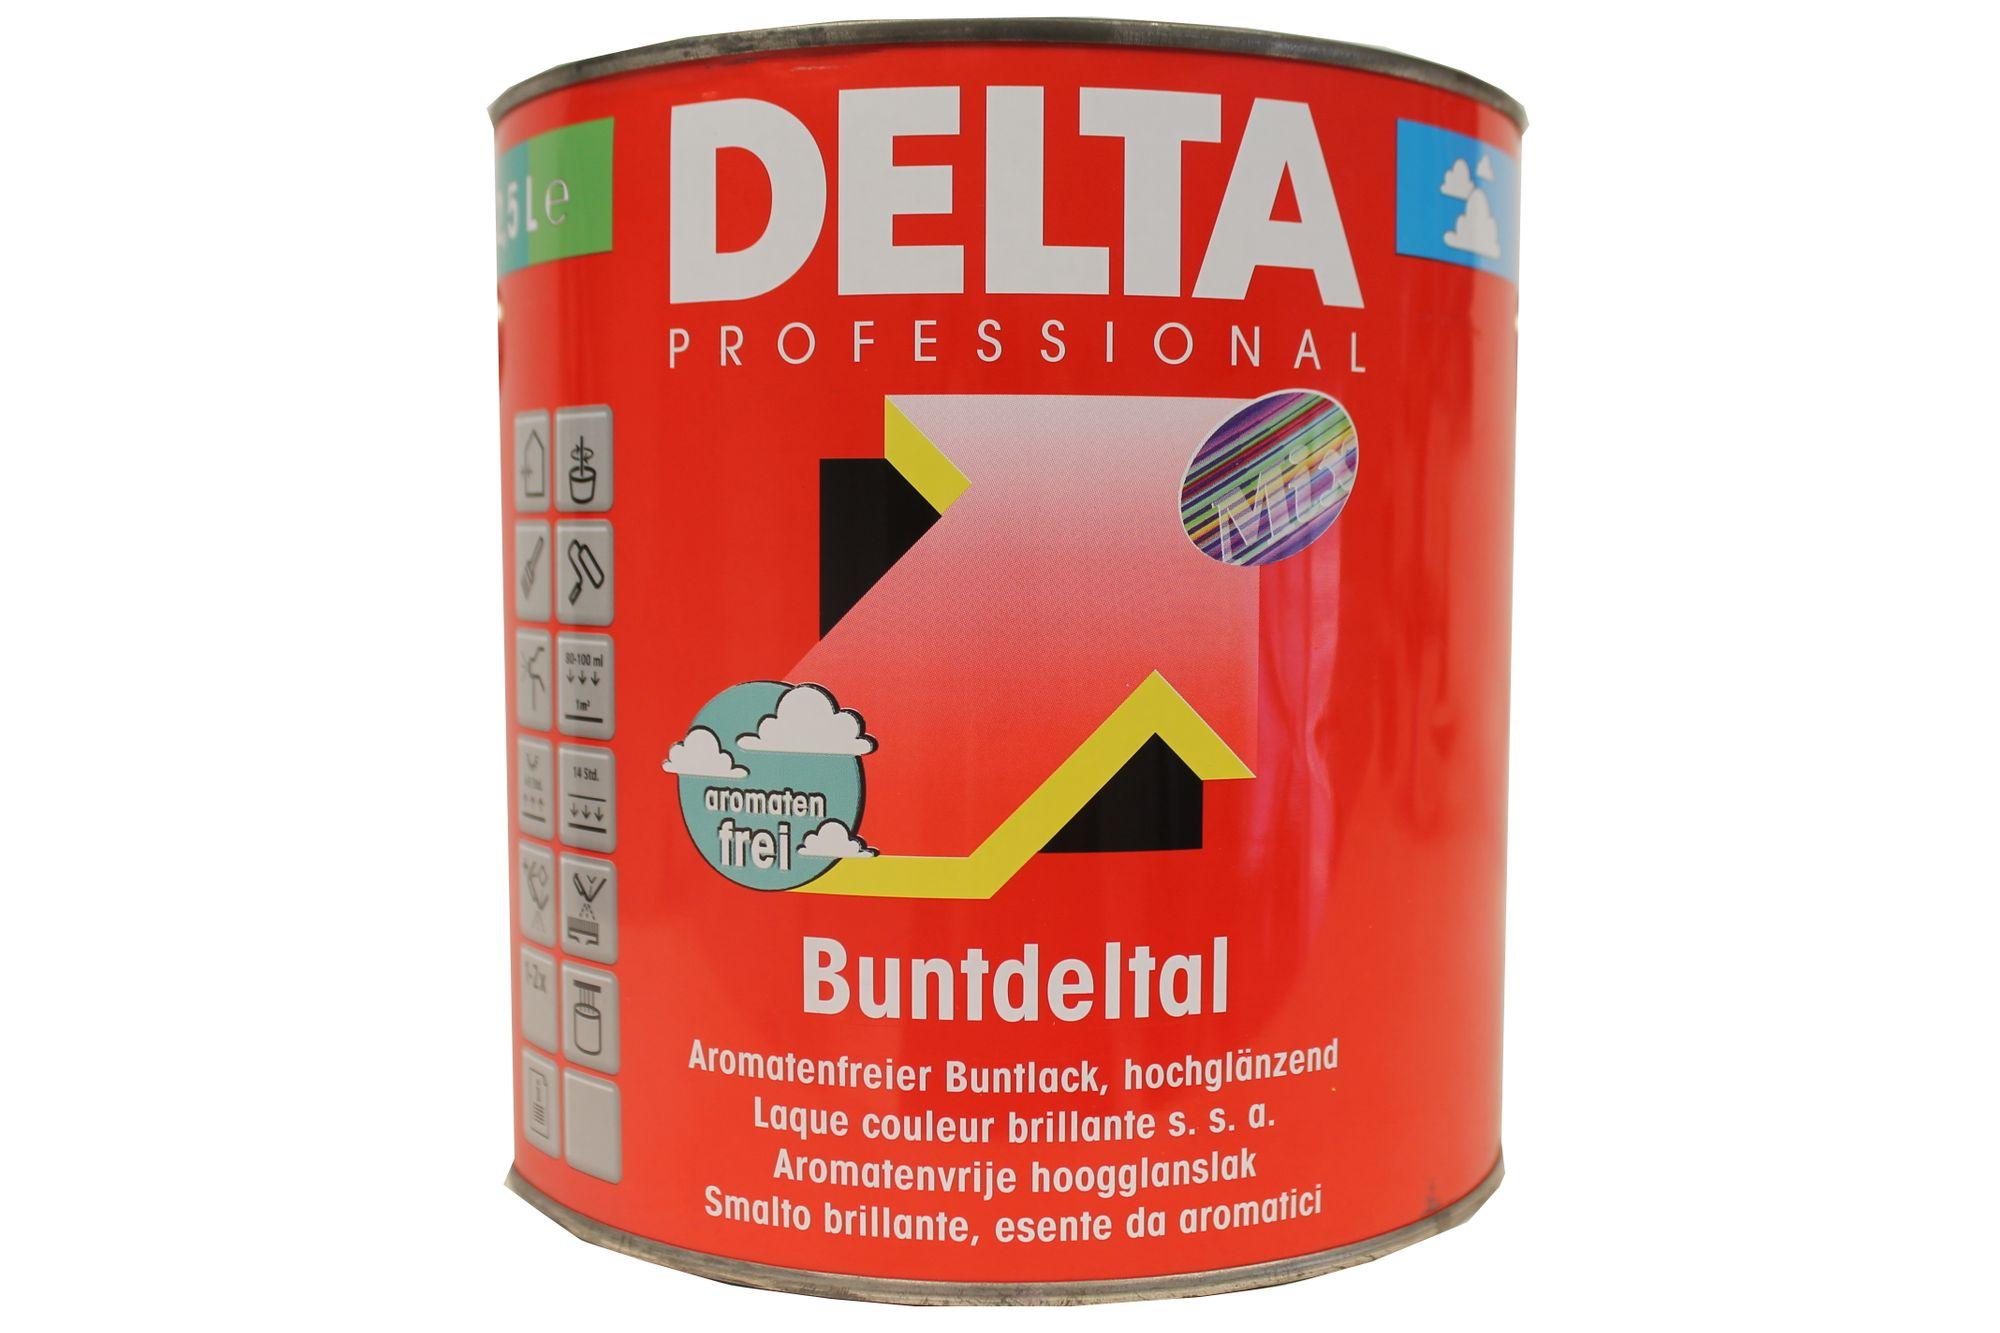 DELTA Professional Buntdeltal-Mix hochglänzend 2,5 Liter Farbwahl